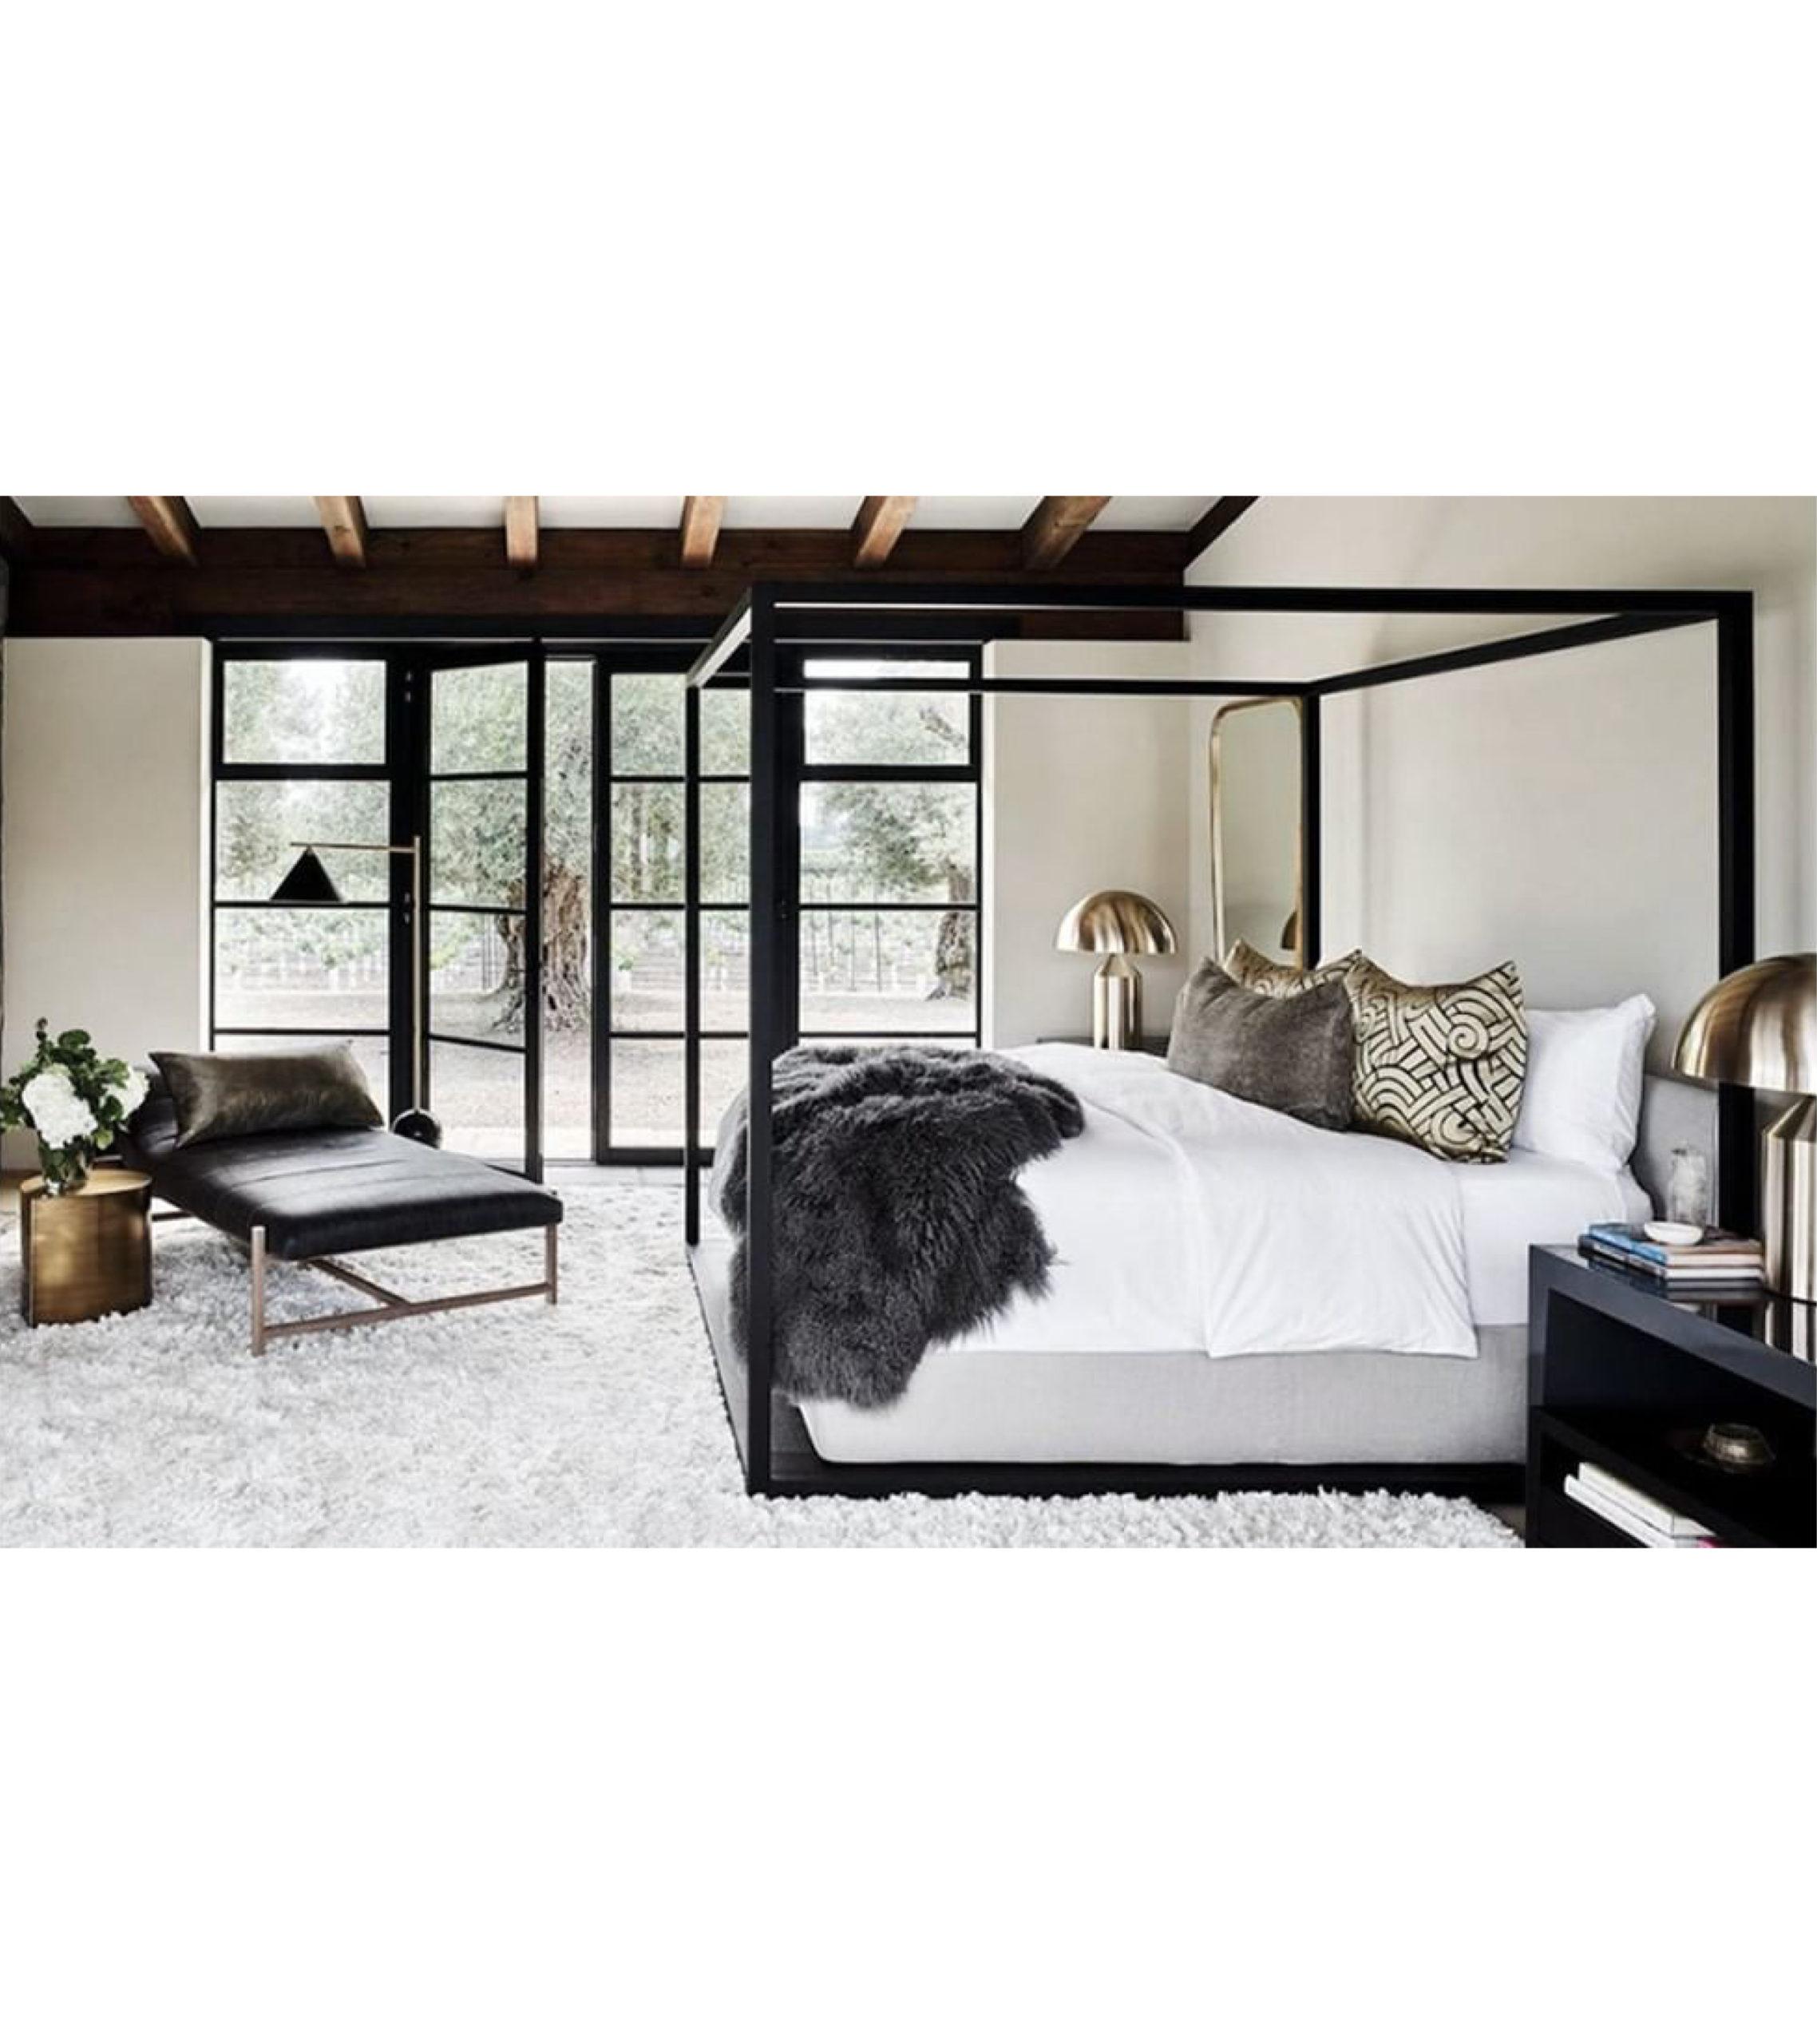 Bedroom Rugs_Nest Casa Hero_R2